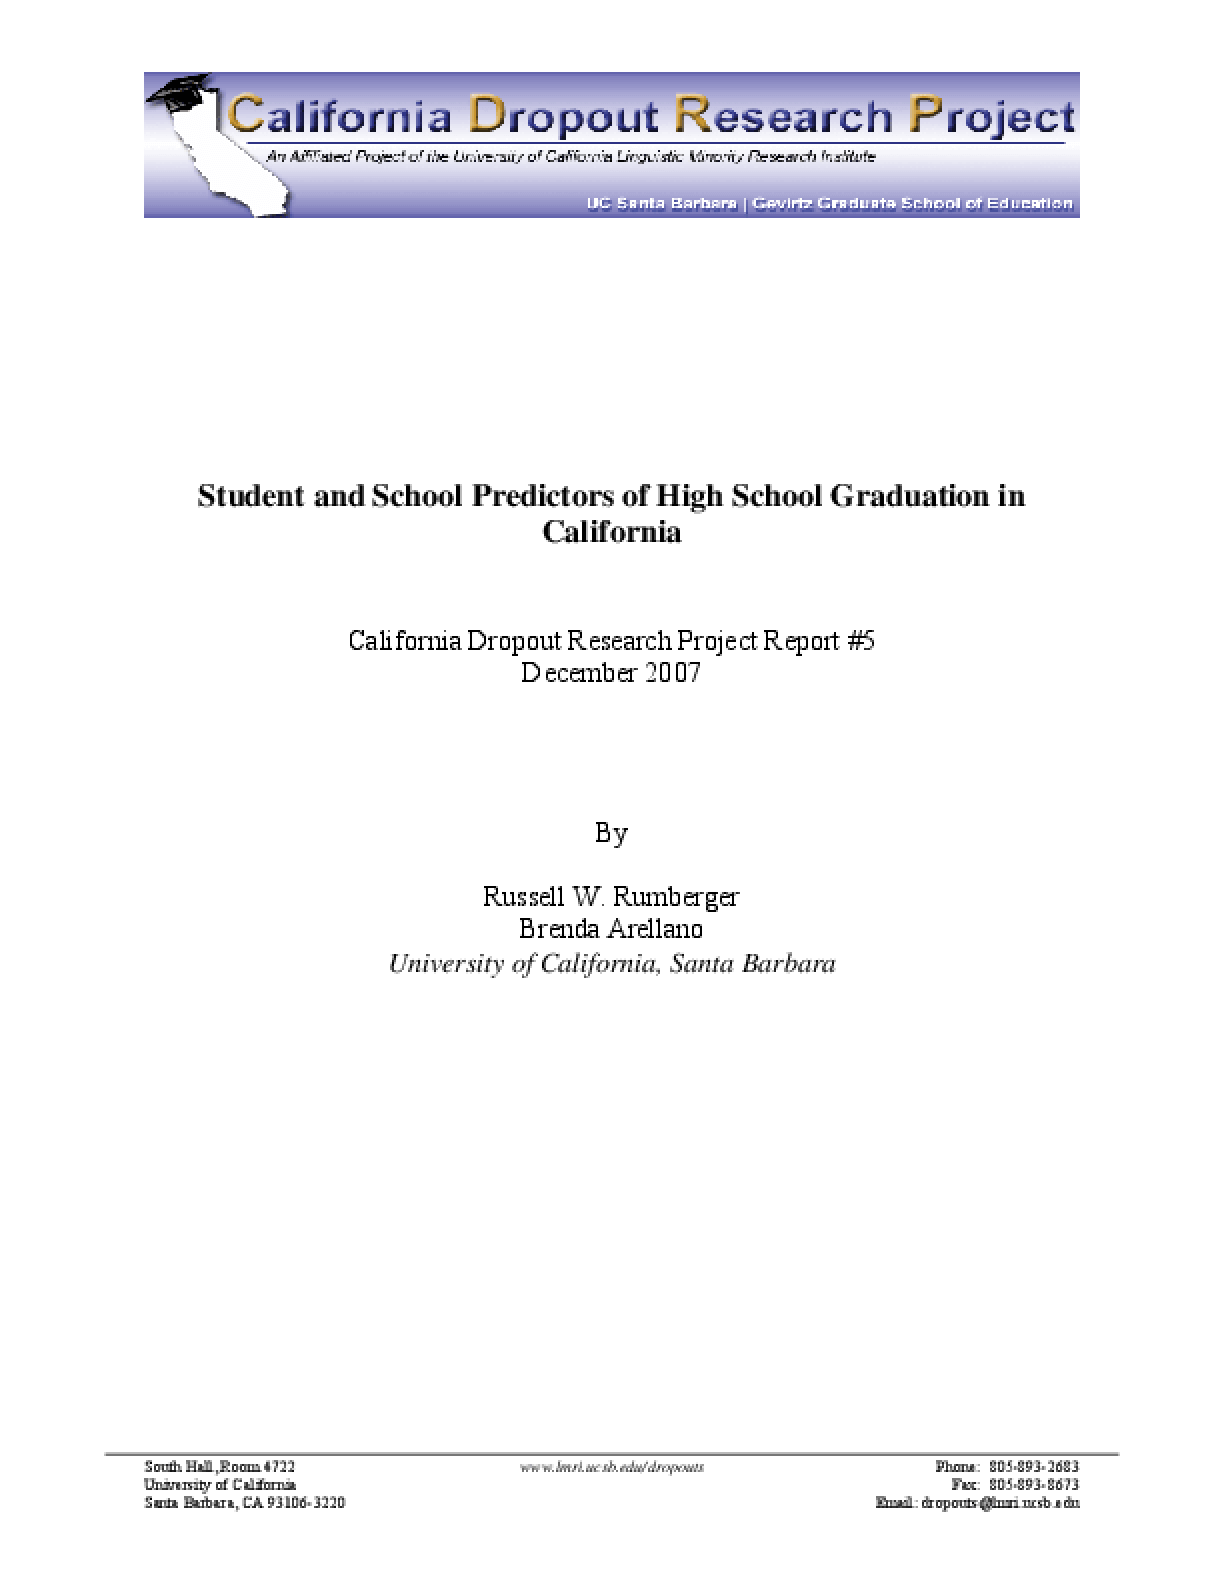 Student and School Predictors of High School Graduation in California